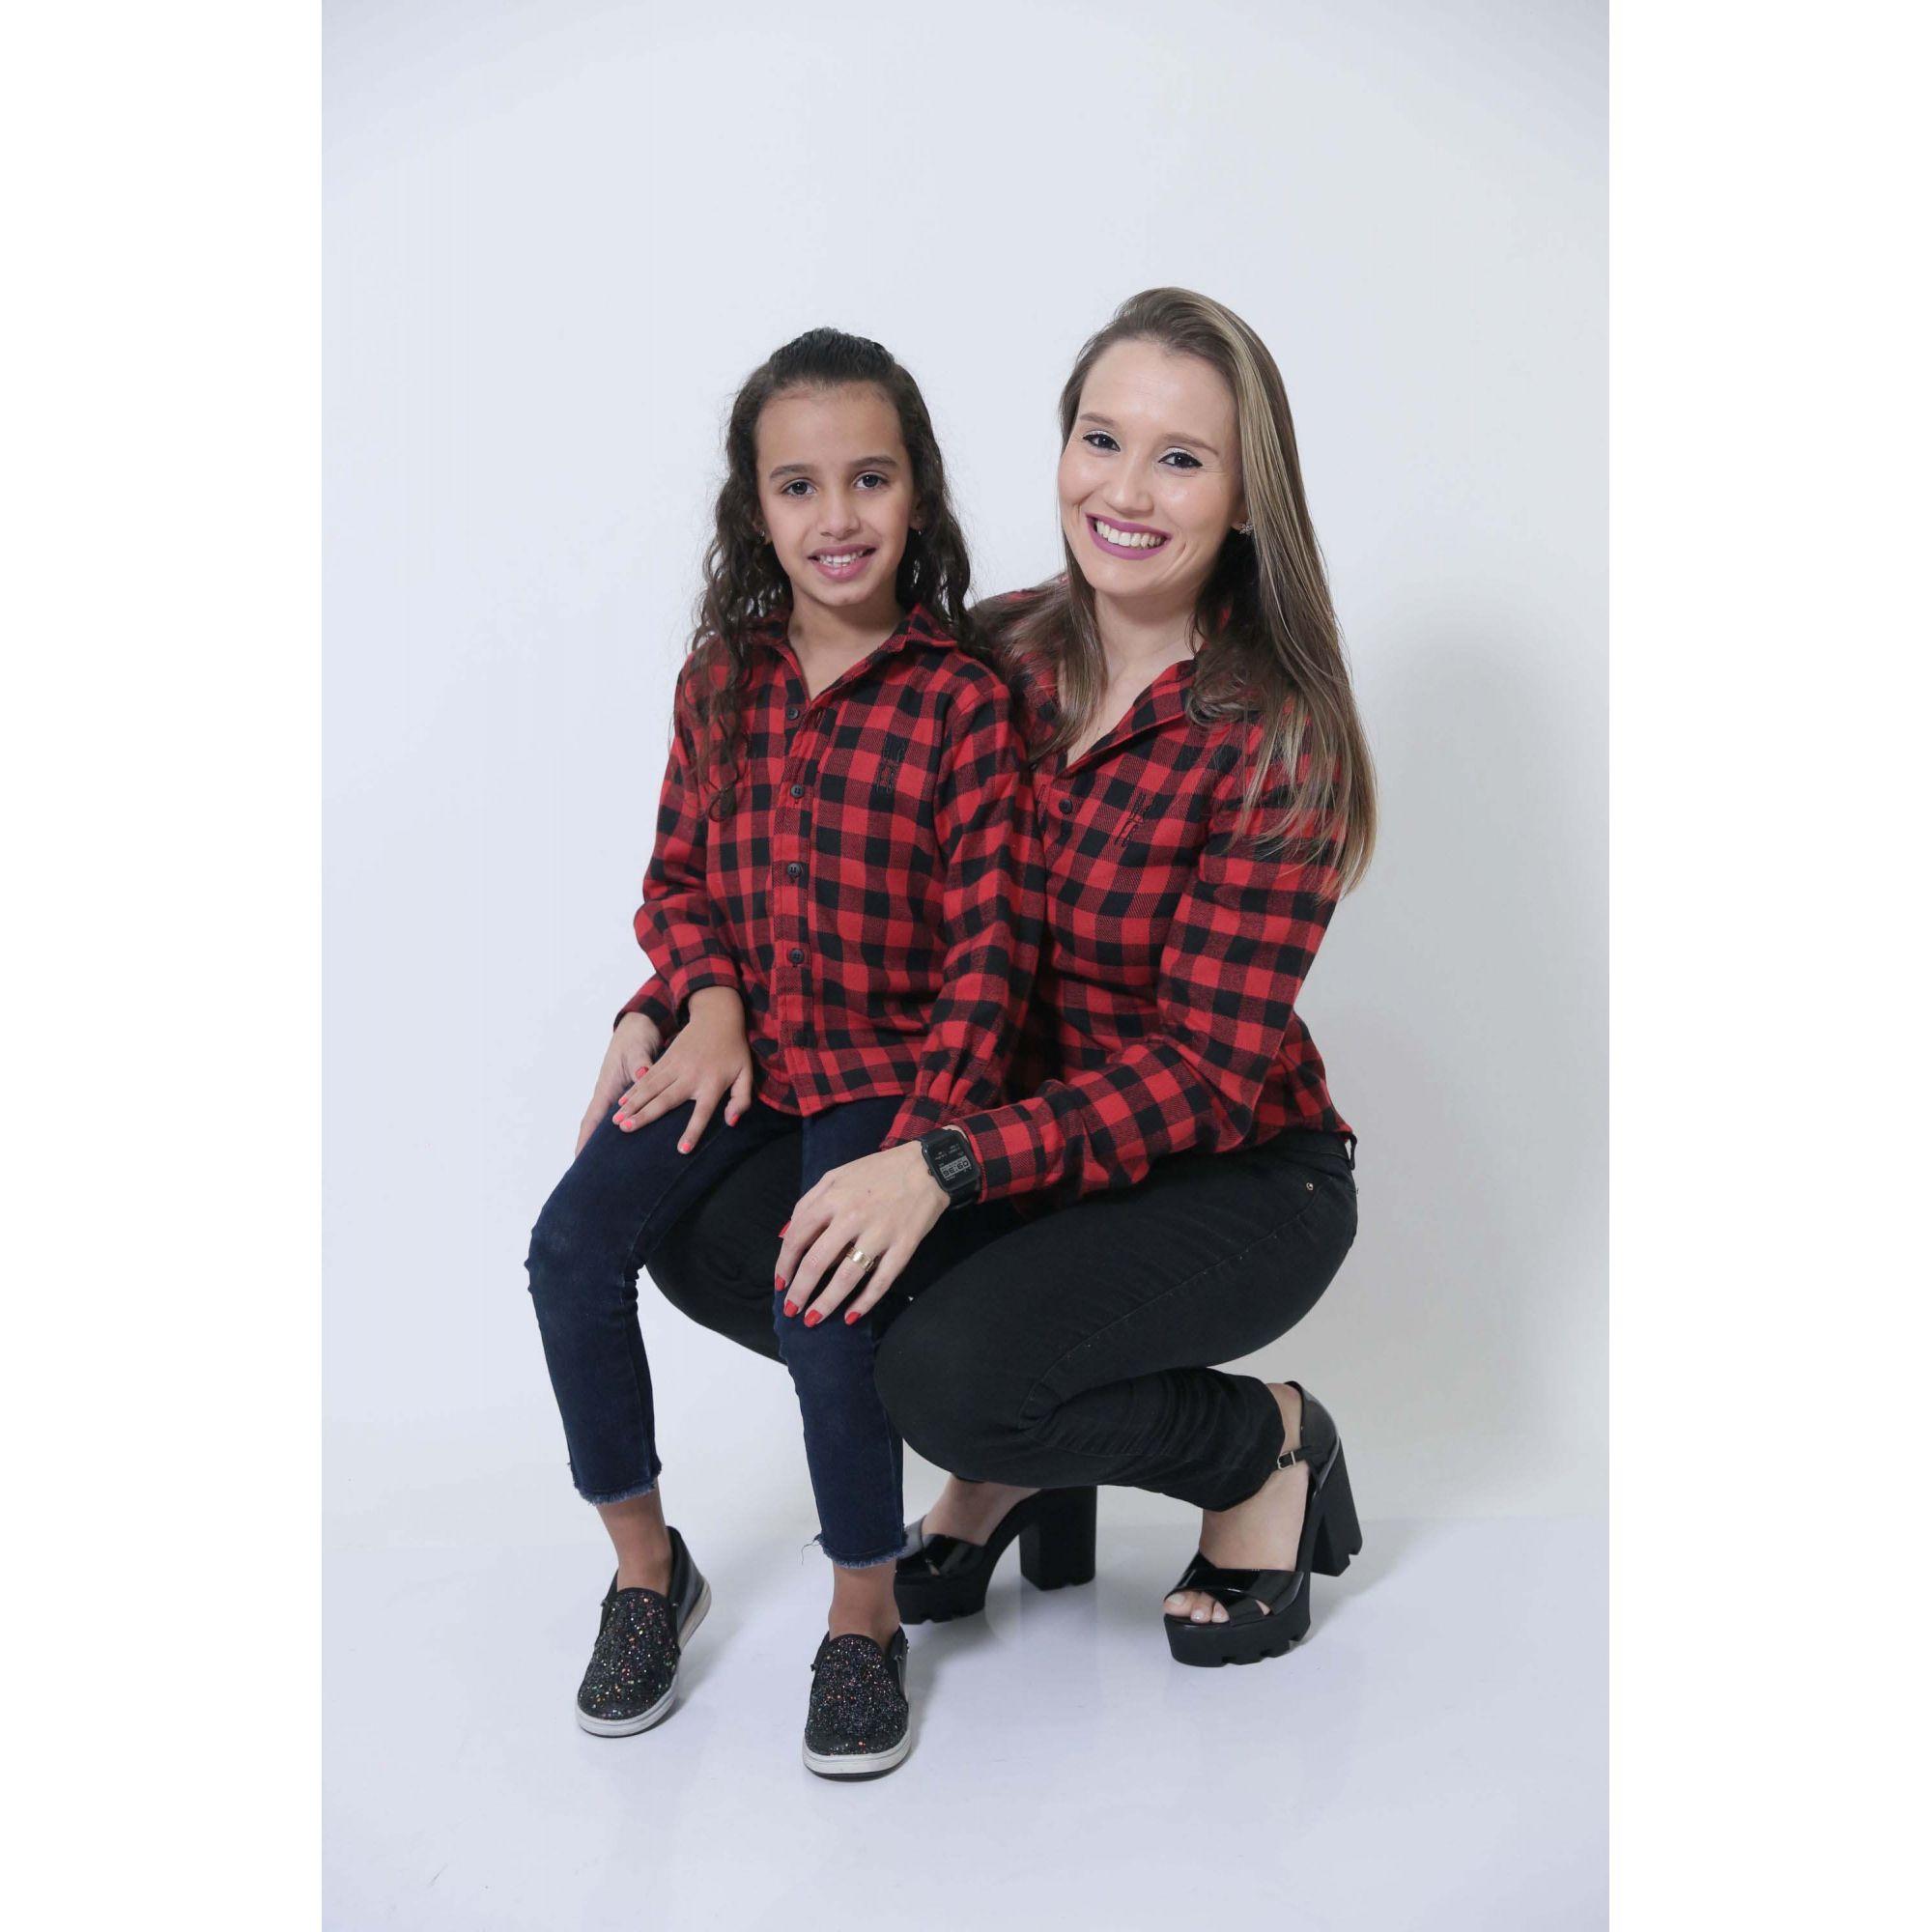 MÃE E FILHA > Kit 02 Camisas Social Xadrez Lenhador [Coleção Tal Mãe Tal Filha]  - Heitor Fashion Brazil